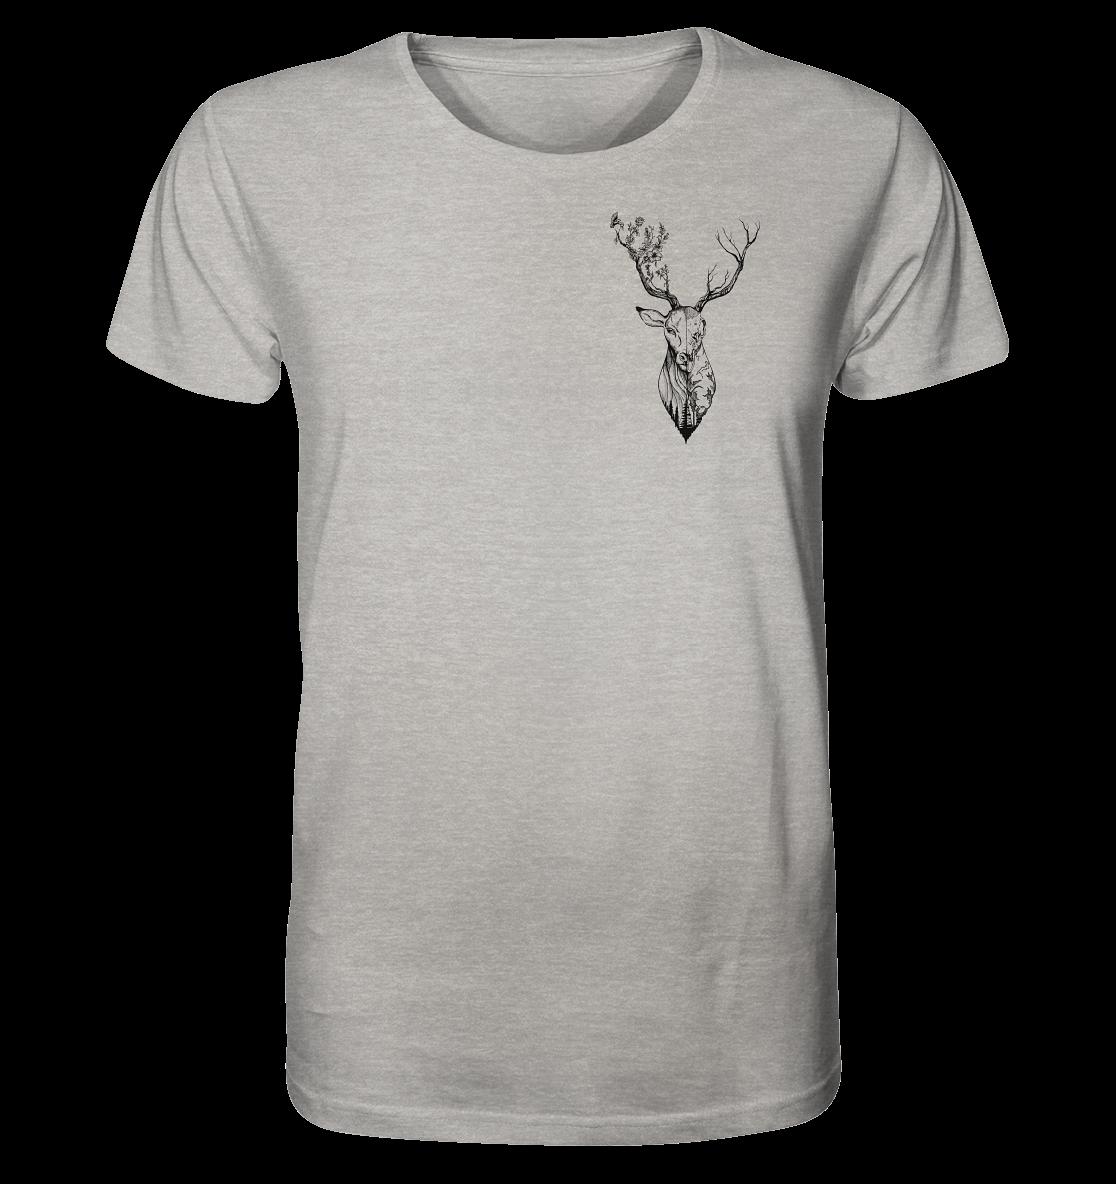 front-organic-shirt-meliert-c2c1c0-1116x-7.png